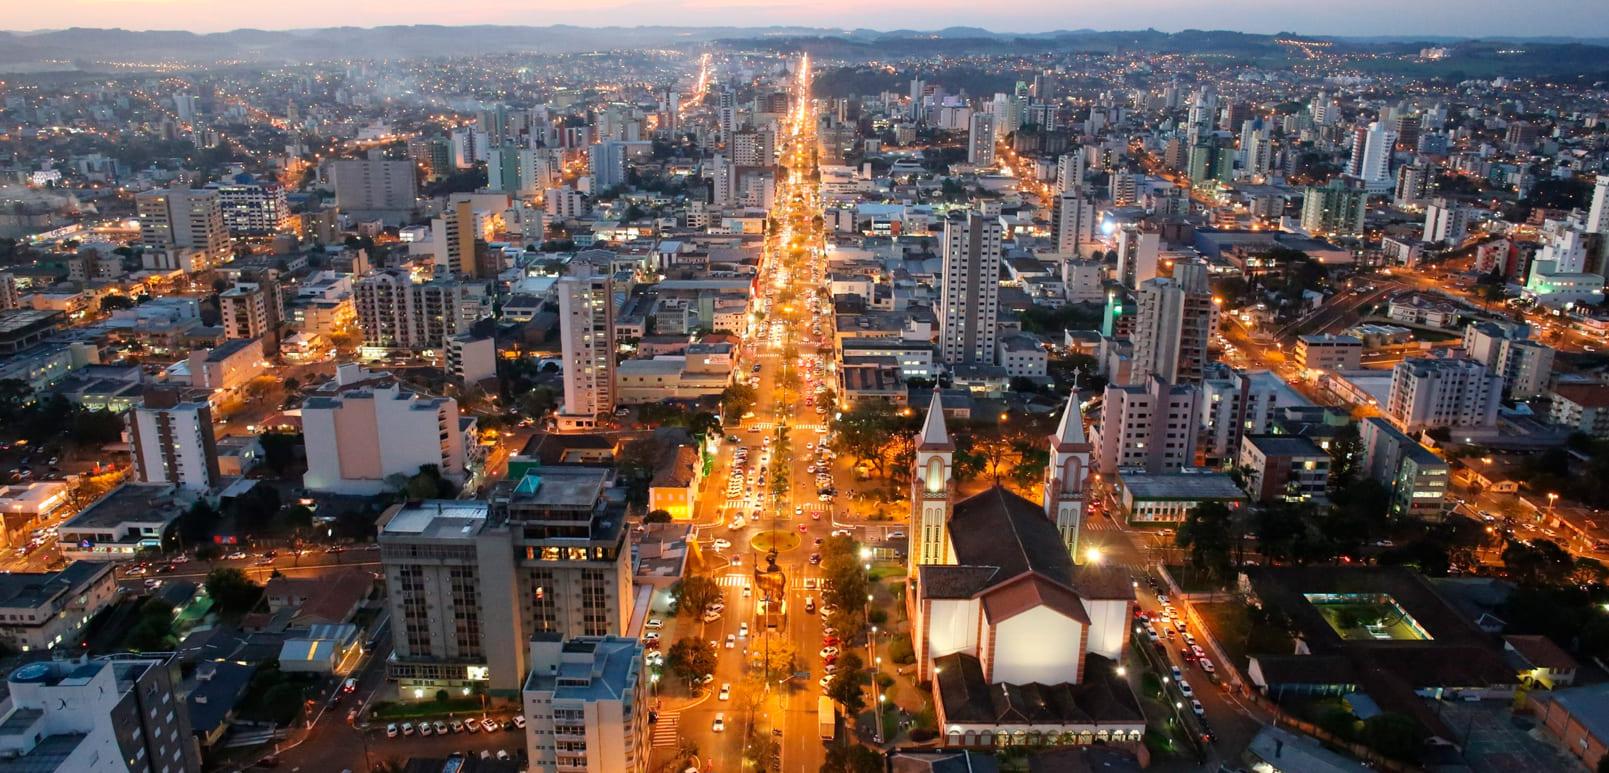 Chapecó Santa Catarina fonte: www.rodosoft.com.br